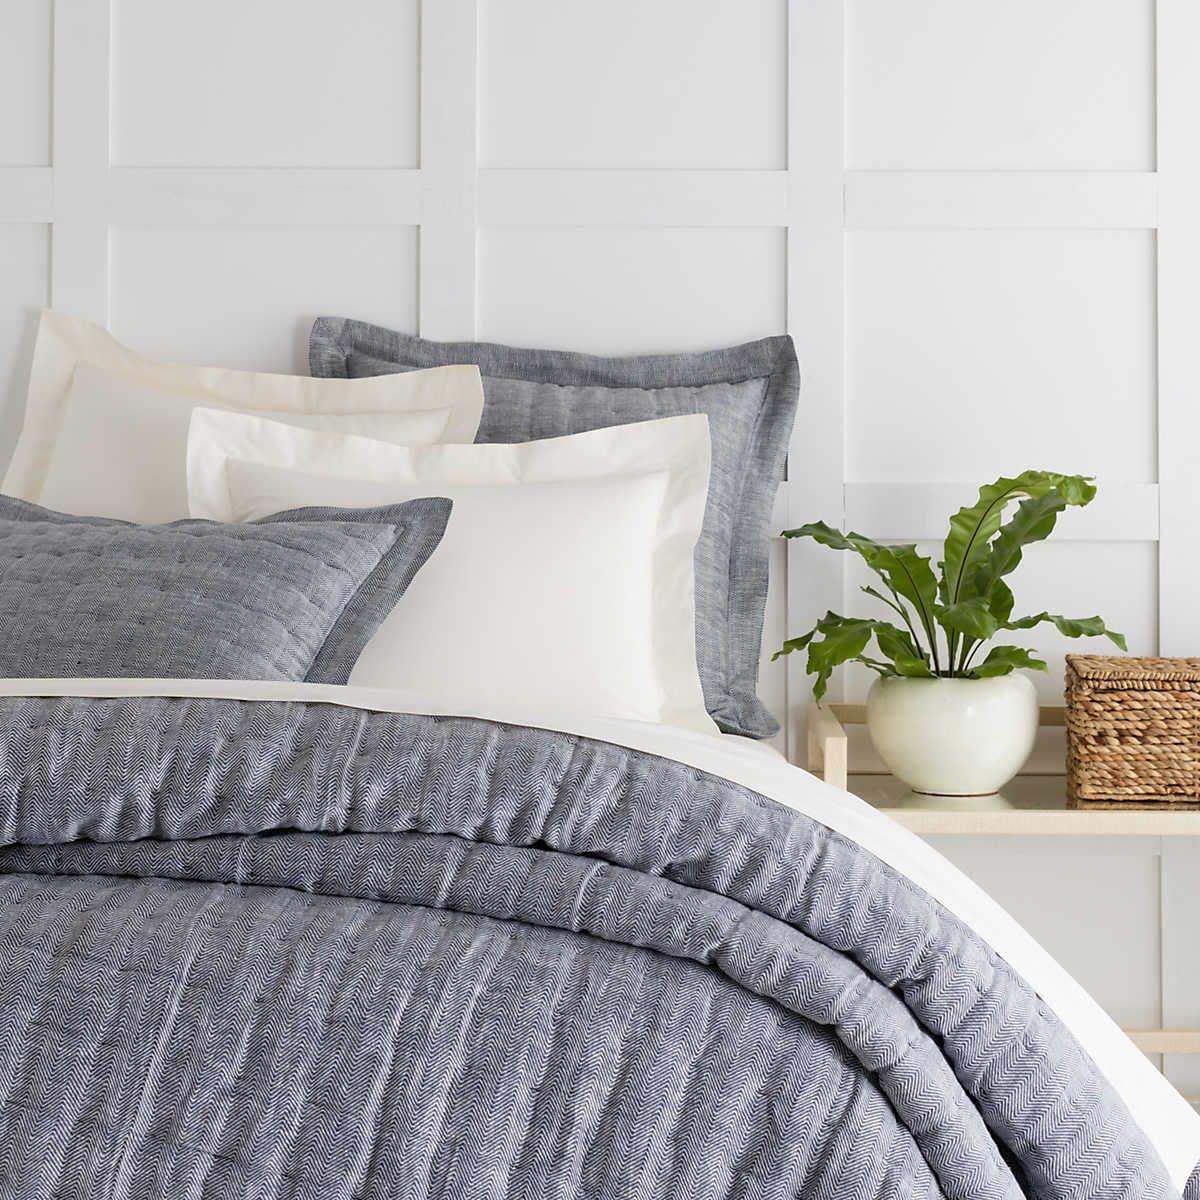 Brussels Indigo Quilt Pine Cone Hill Bed design, Quilt